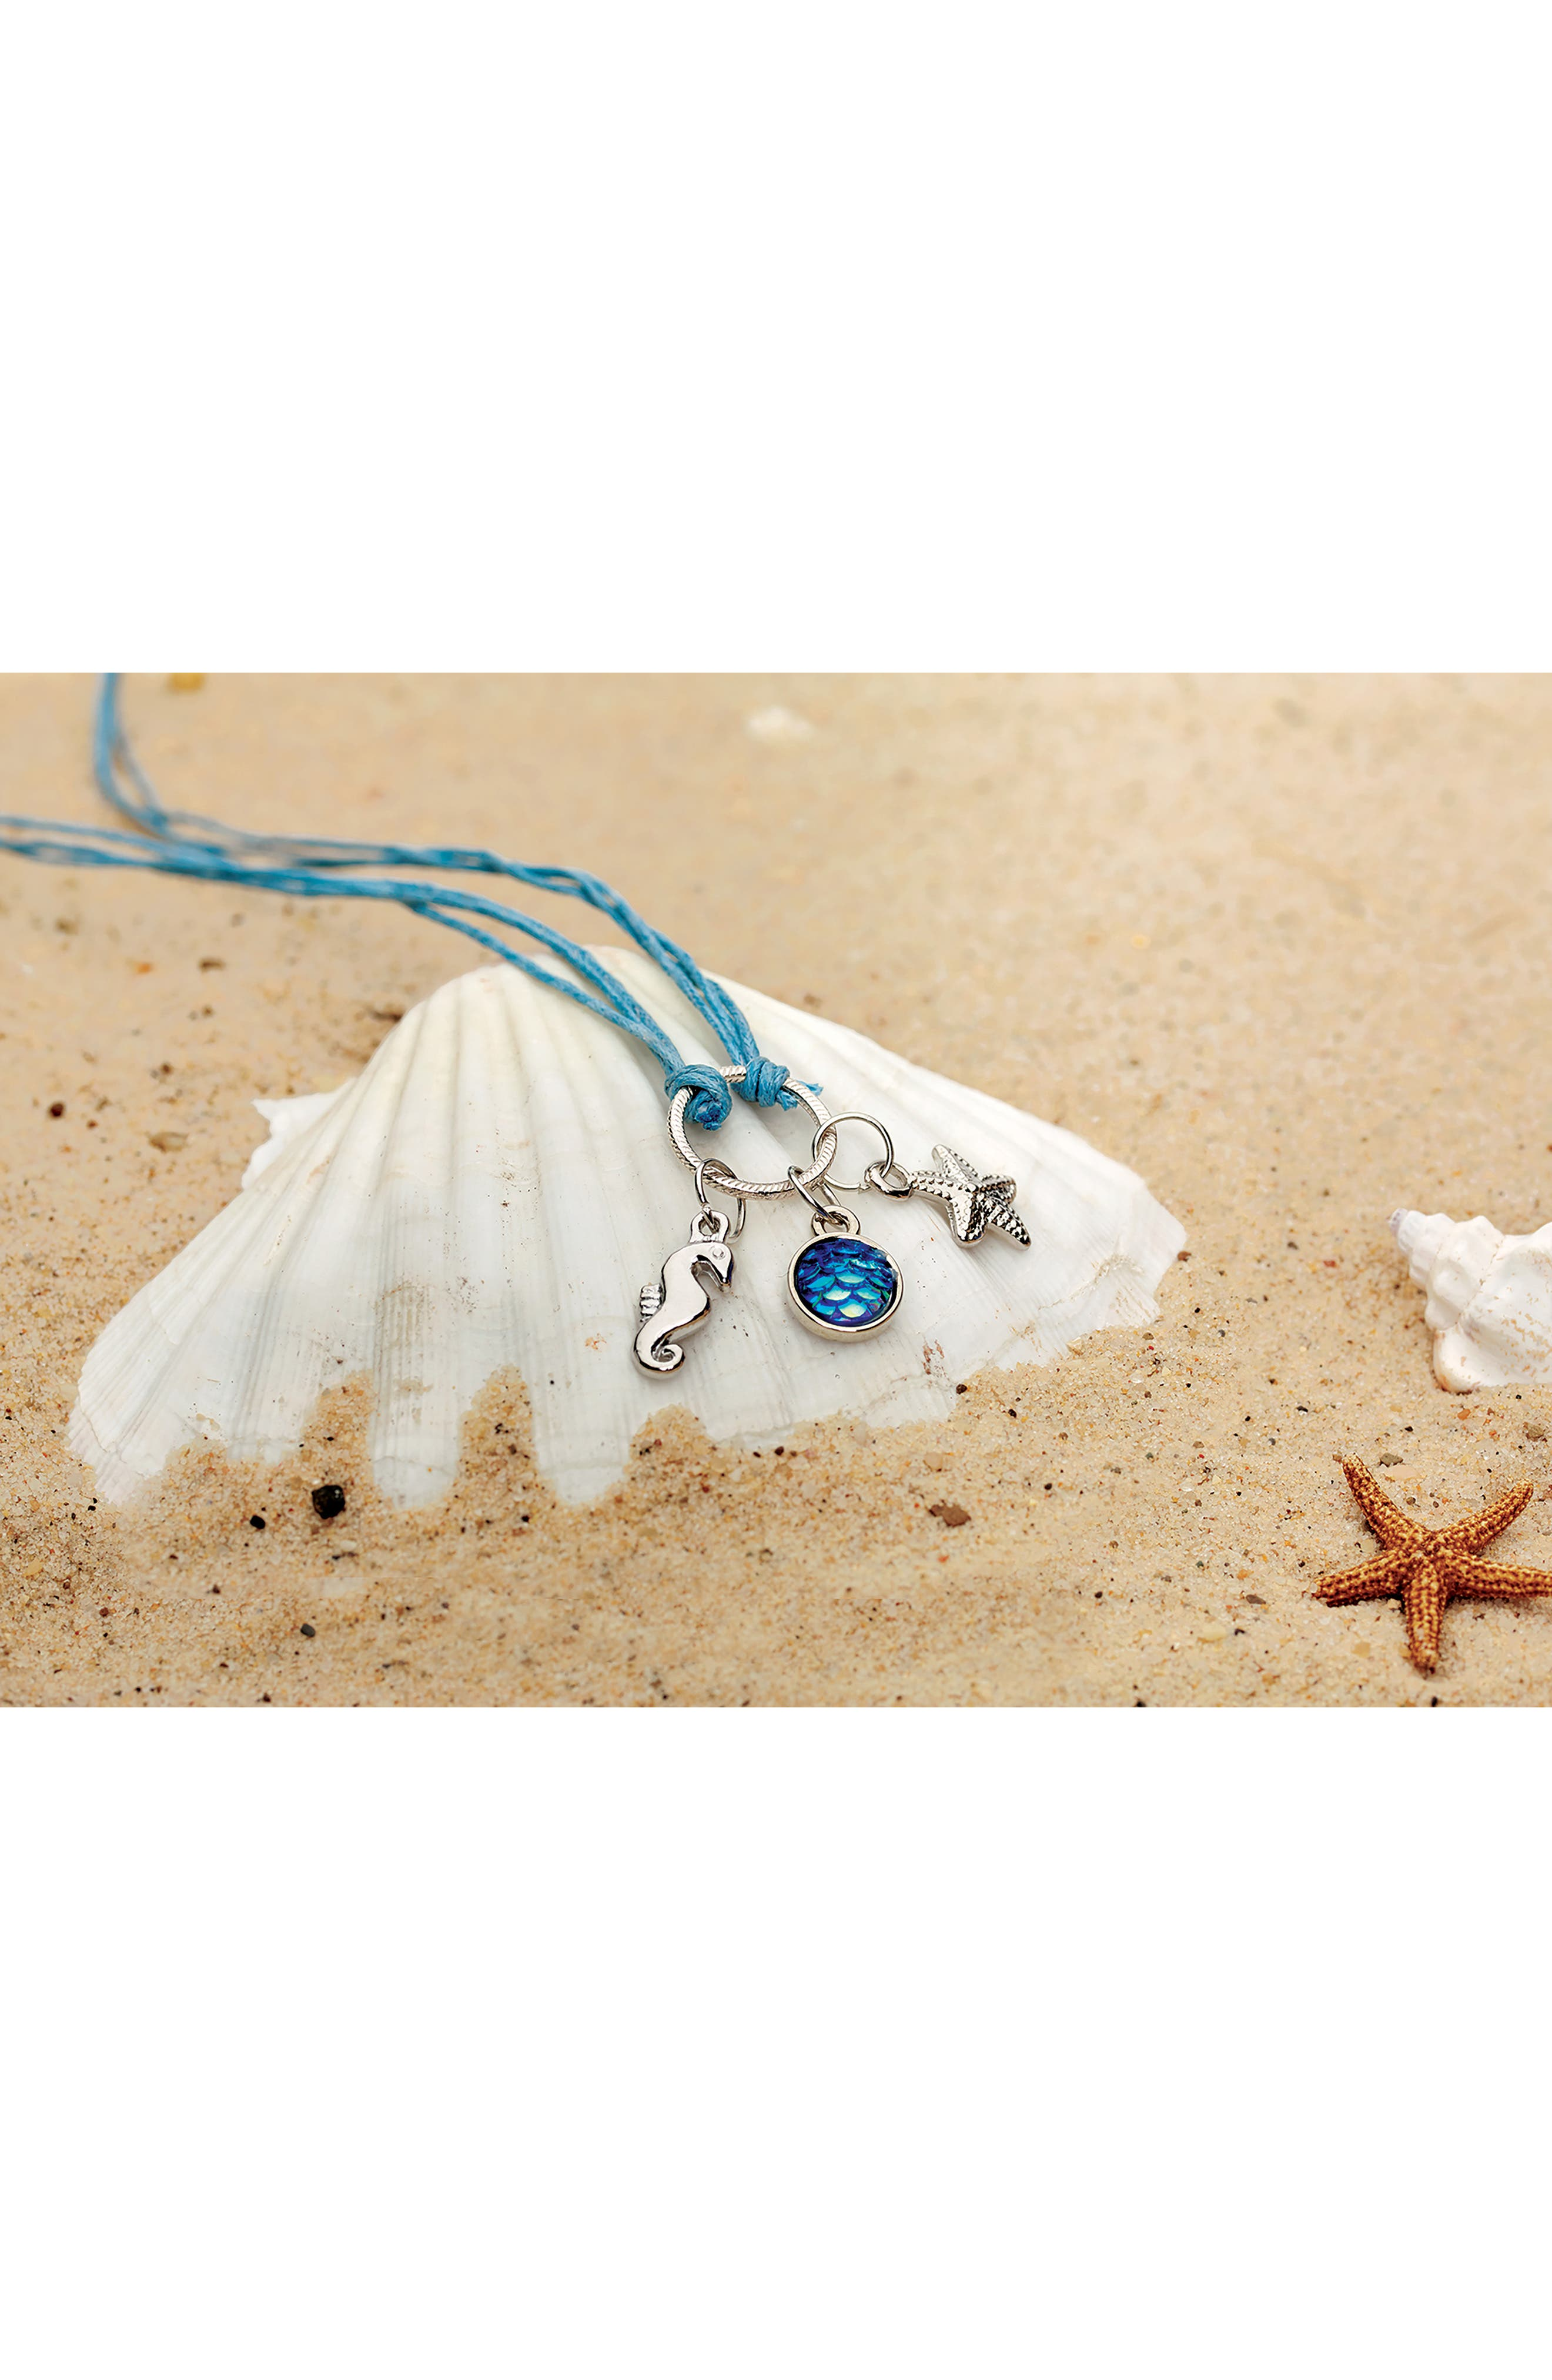 Mermaid Tail Jewelry Maker,                             Alternate thumbnail 6, color,                             450